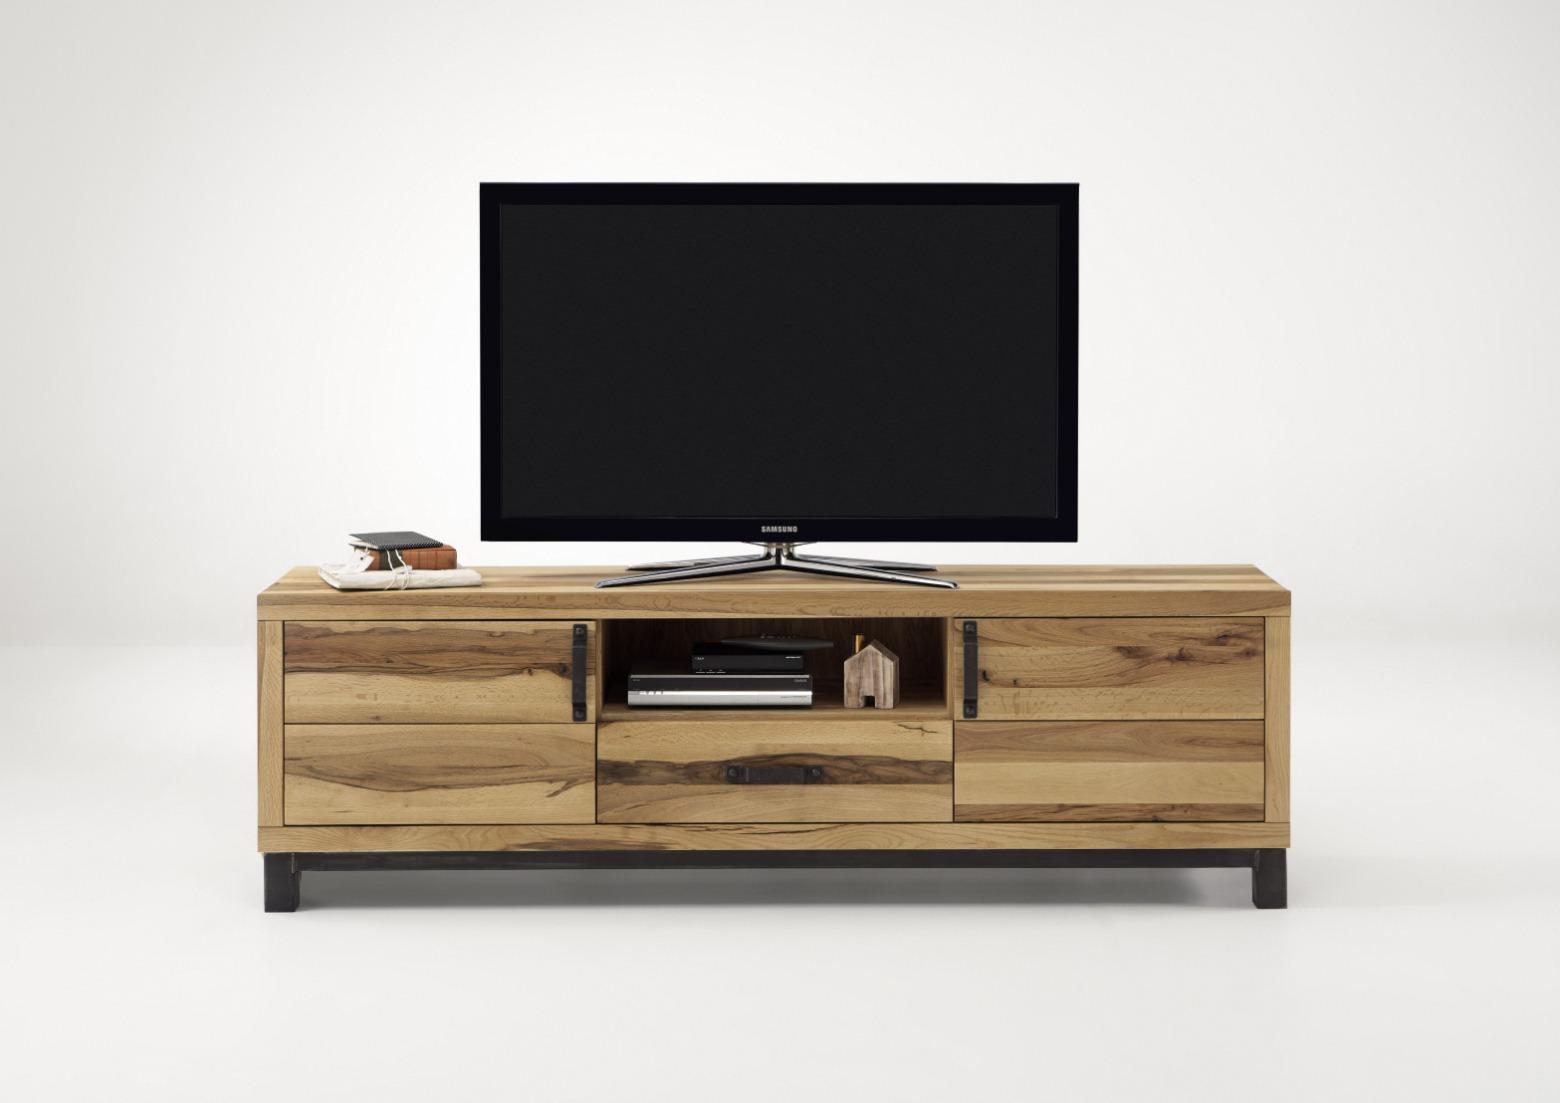 Tv Schrank Tv Lowboard Bern 2 Turen 1 Schublade 1 Fach Tv